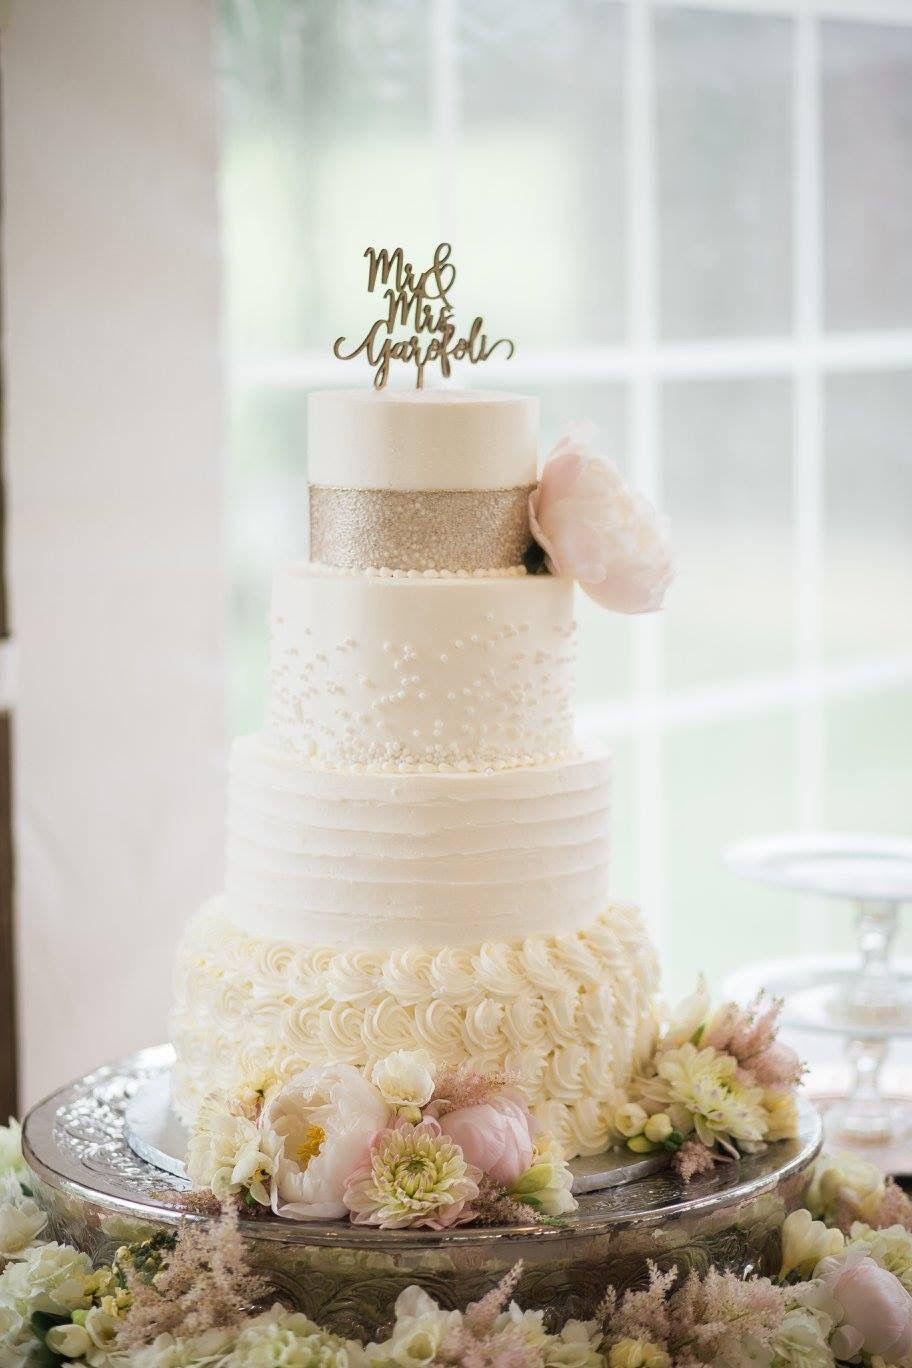 Wedding Cake Silver Cake Stand Rose Gold Wedding Silver Cake Stand Rose Gold Wedding Wedding Cakes